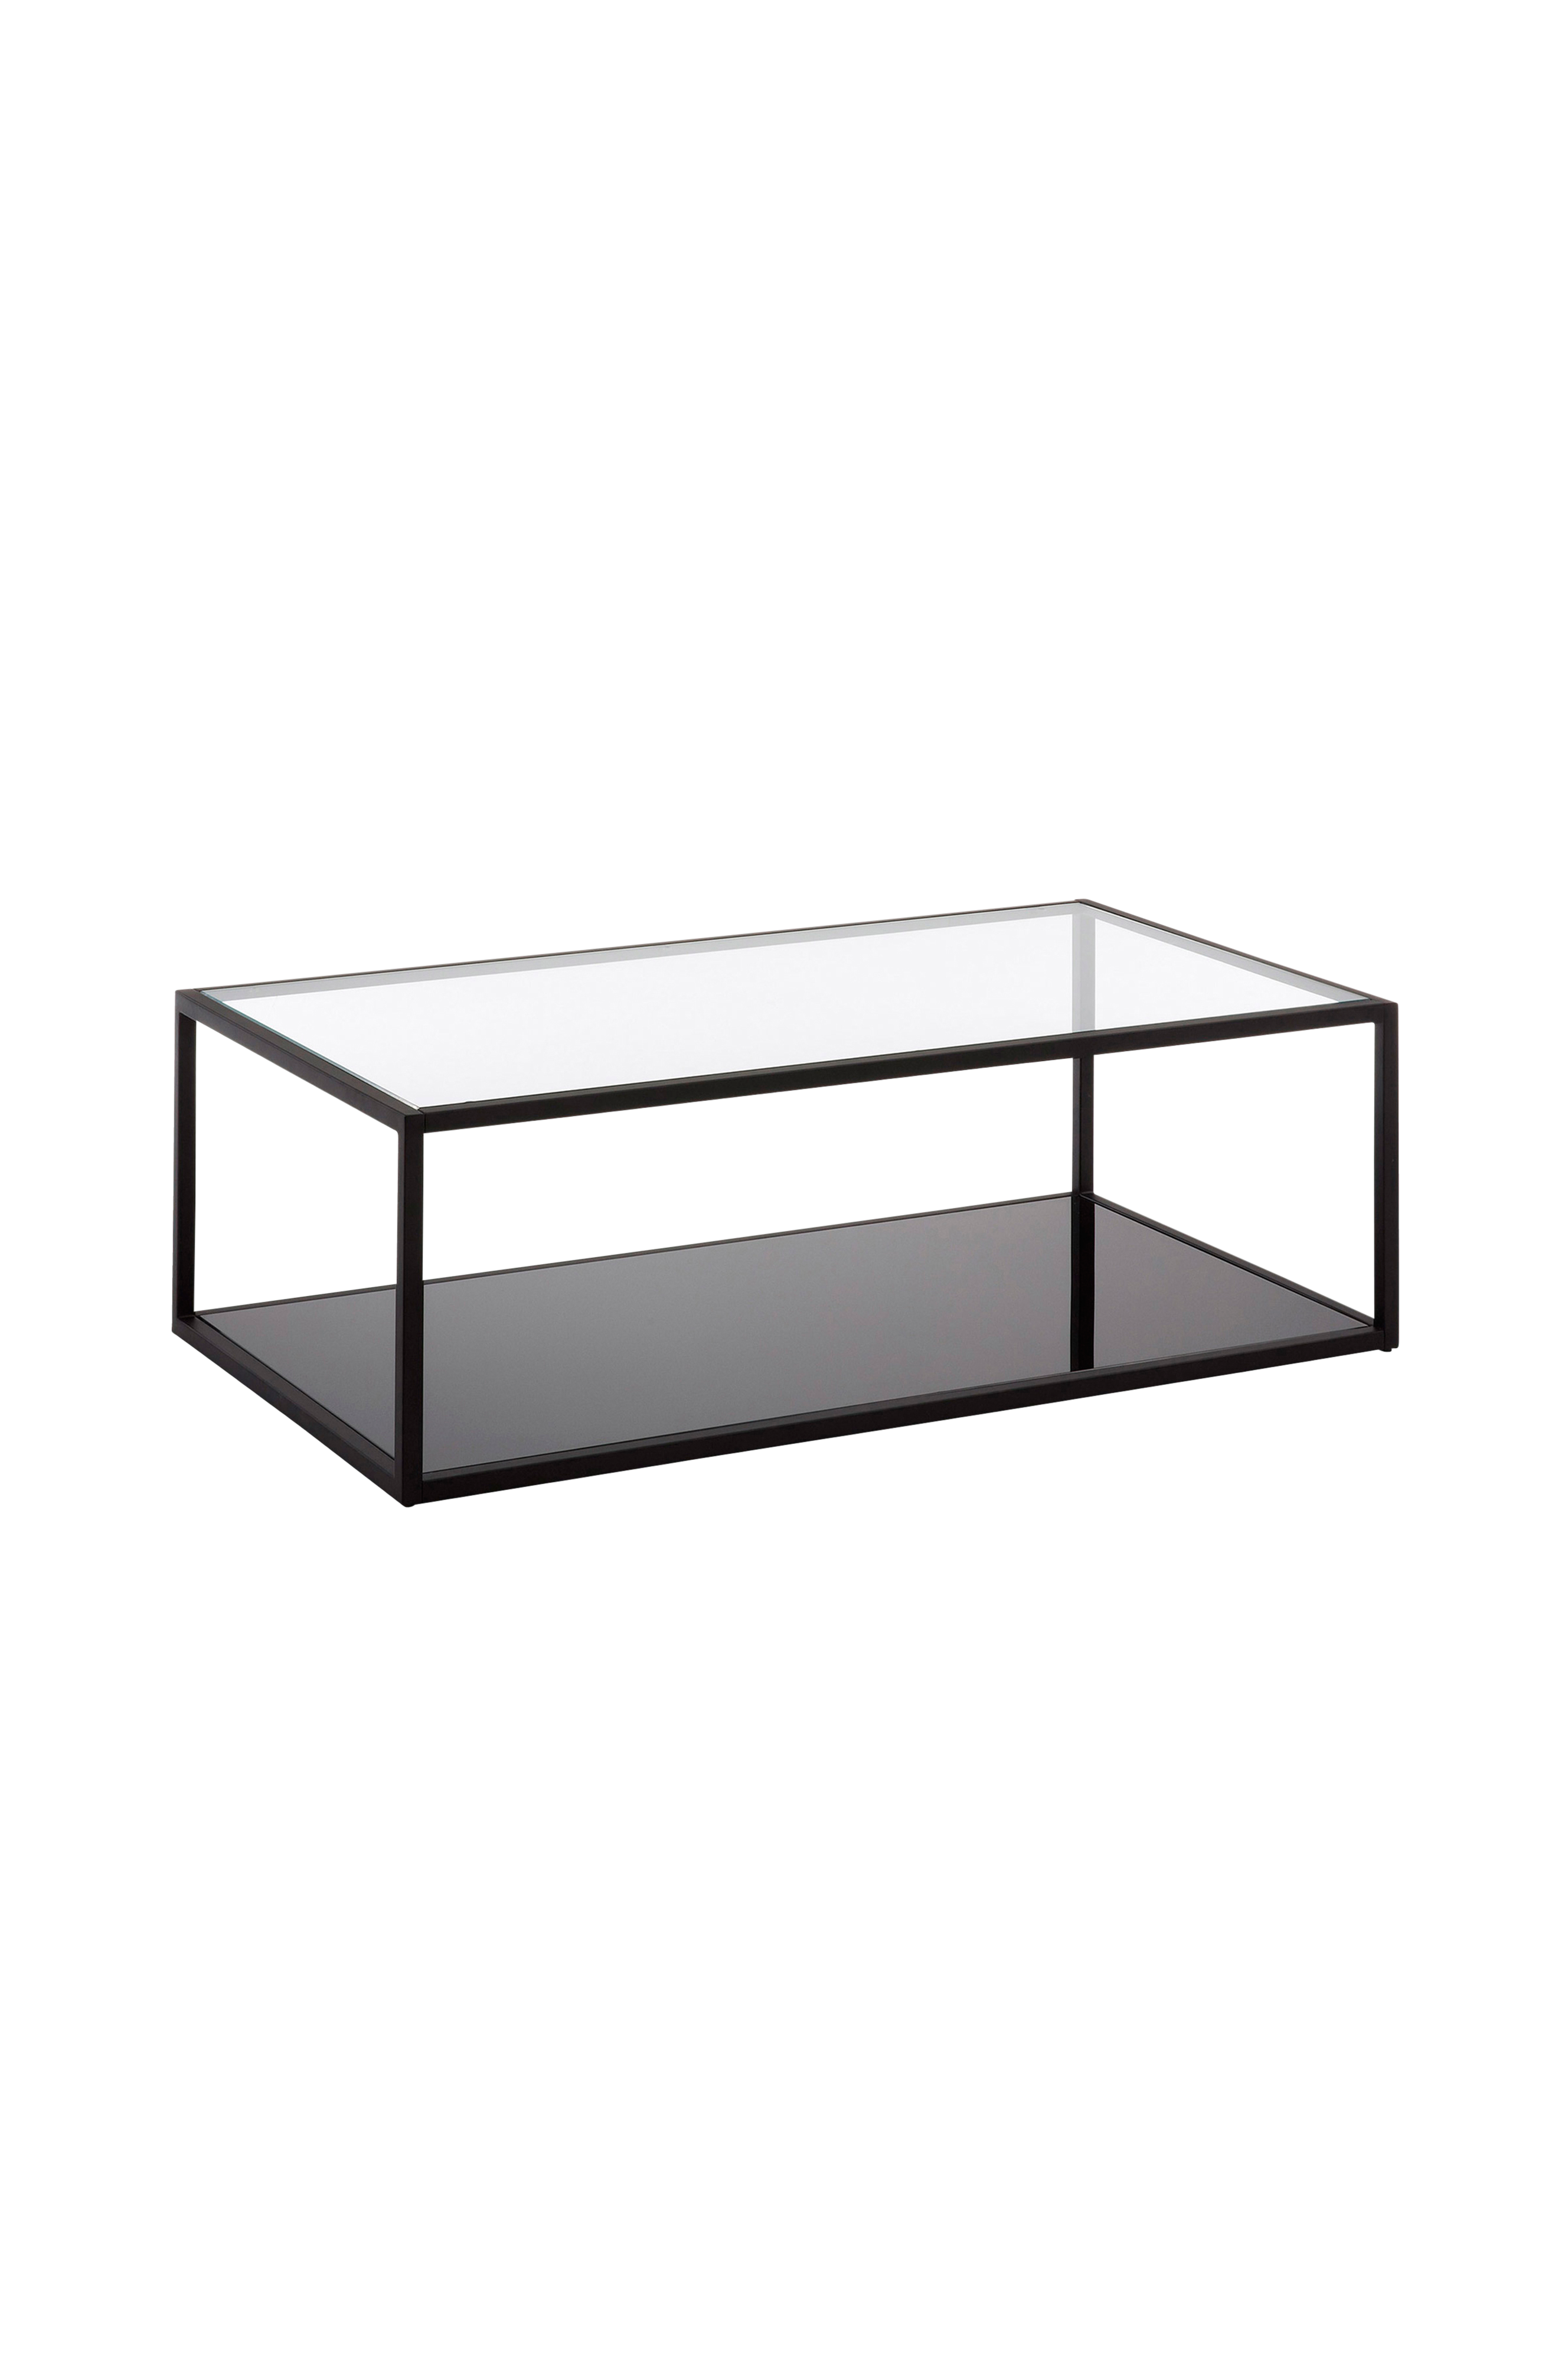 Ellos Home Soffbord GREENHILL 110×60 metall glas svart transparent Glas Hem& inredning